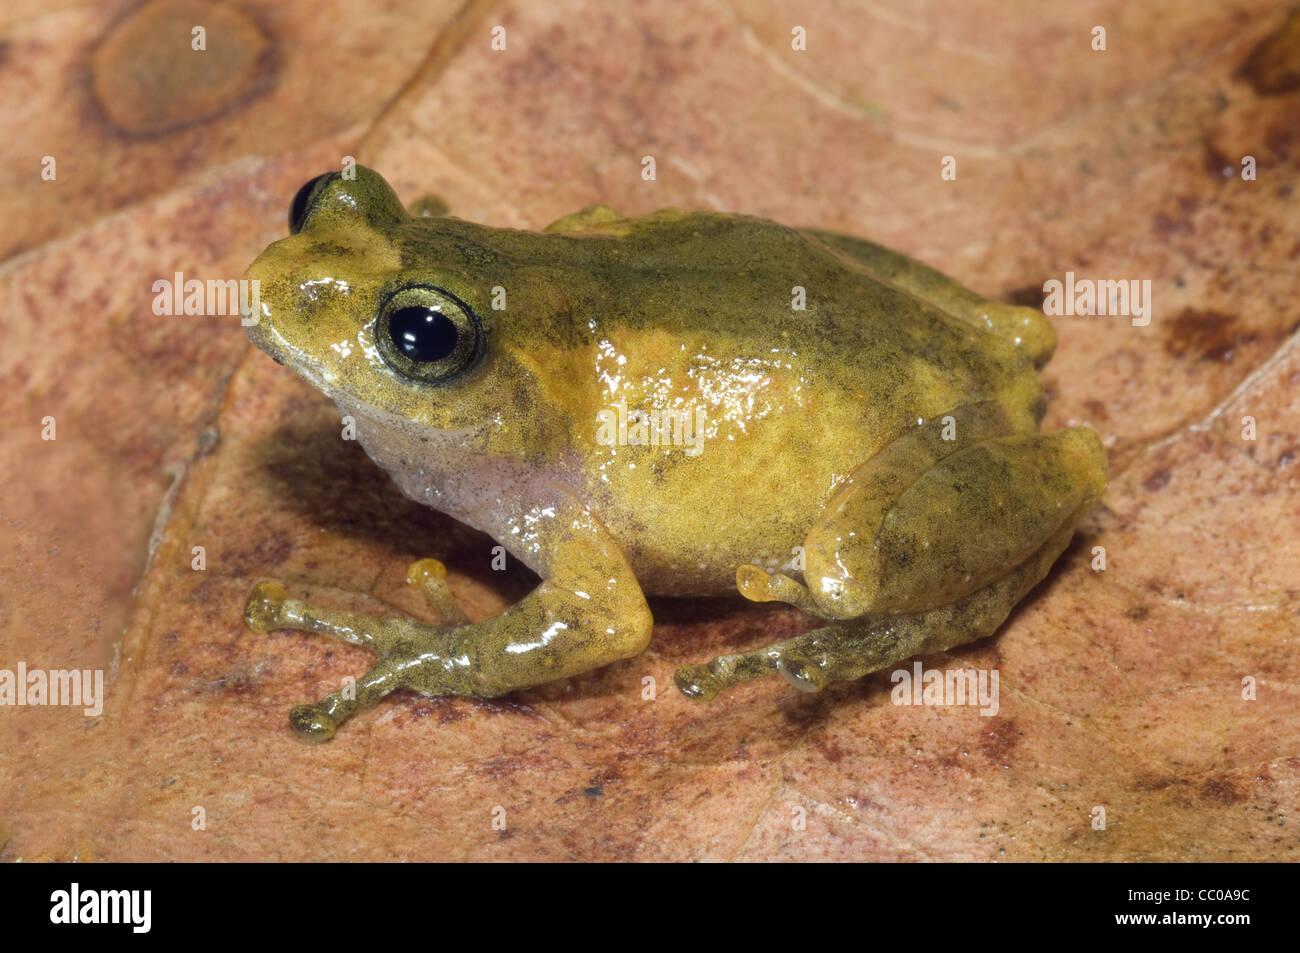 Philatus species, a bush frog from northeast India - Stock Image